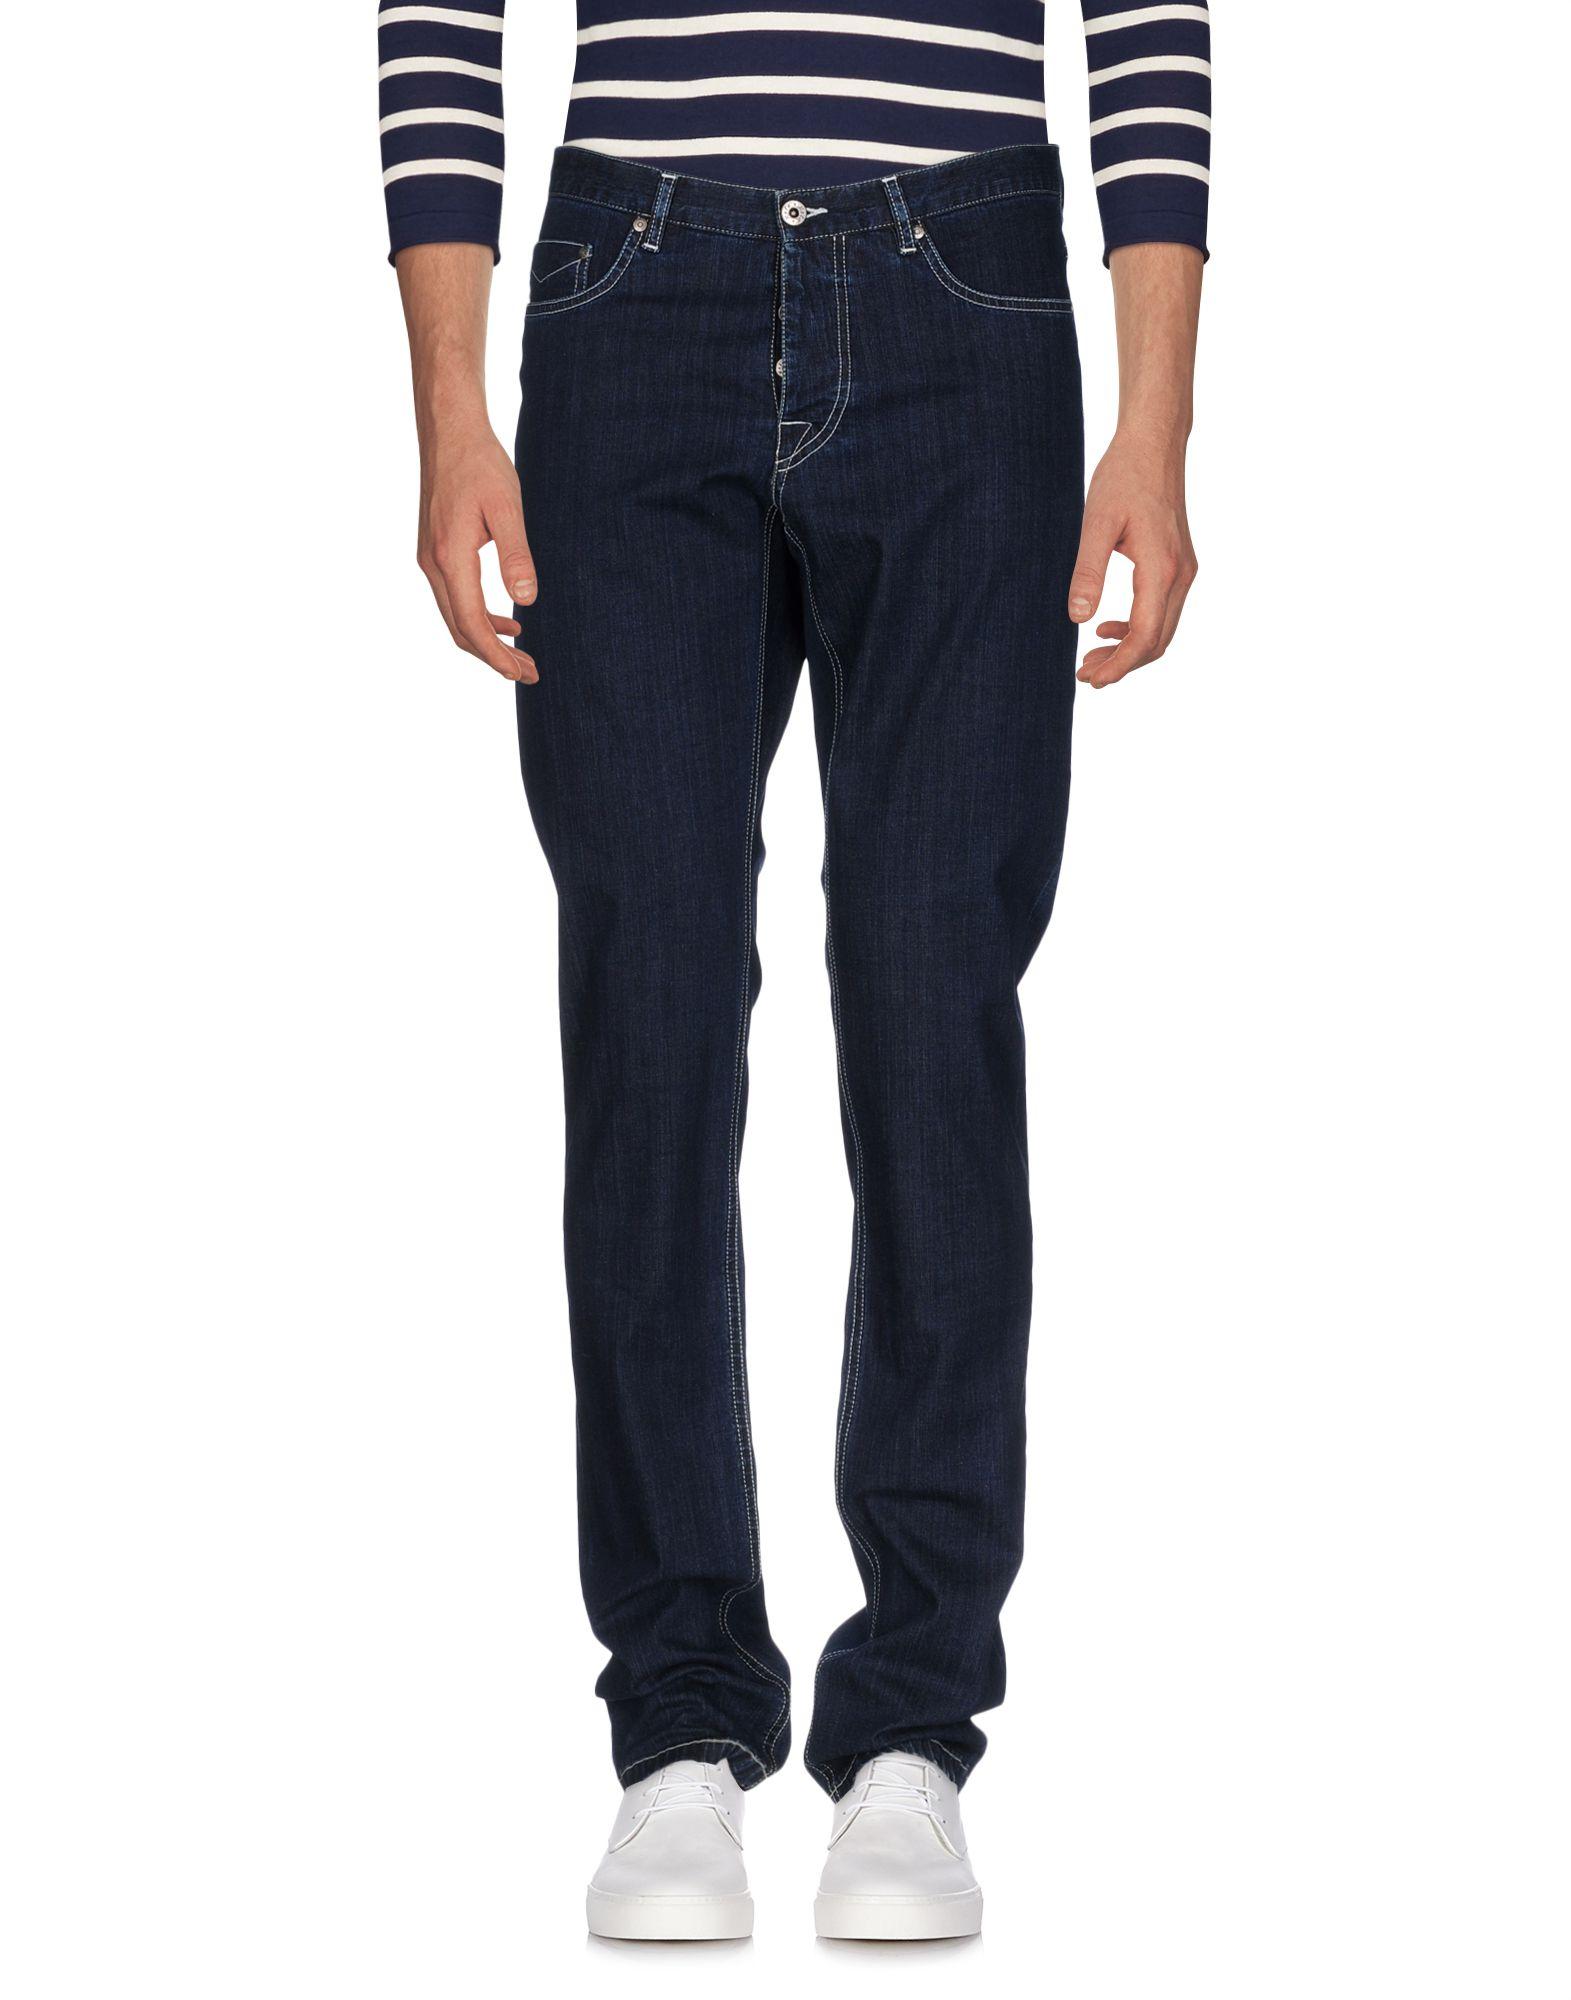 Pantaloni Jeans Rotasport Donna - Acquista online su